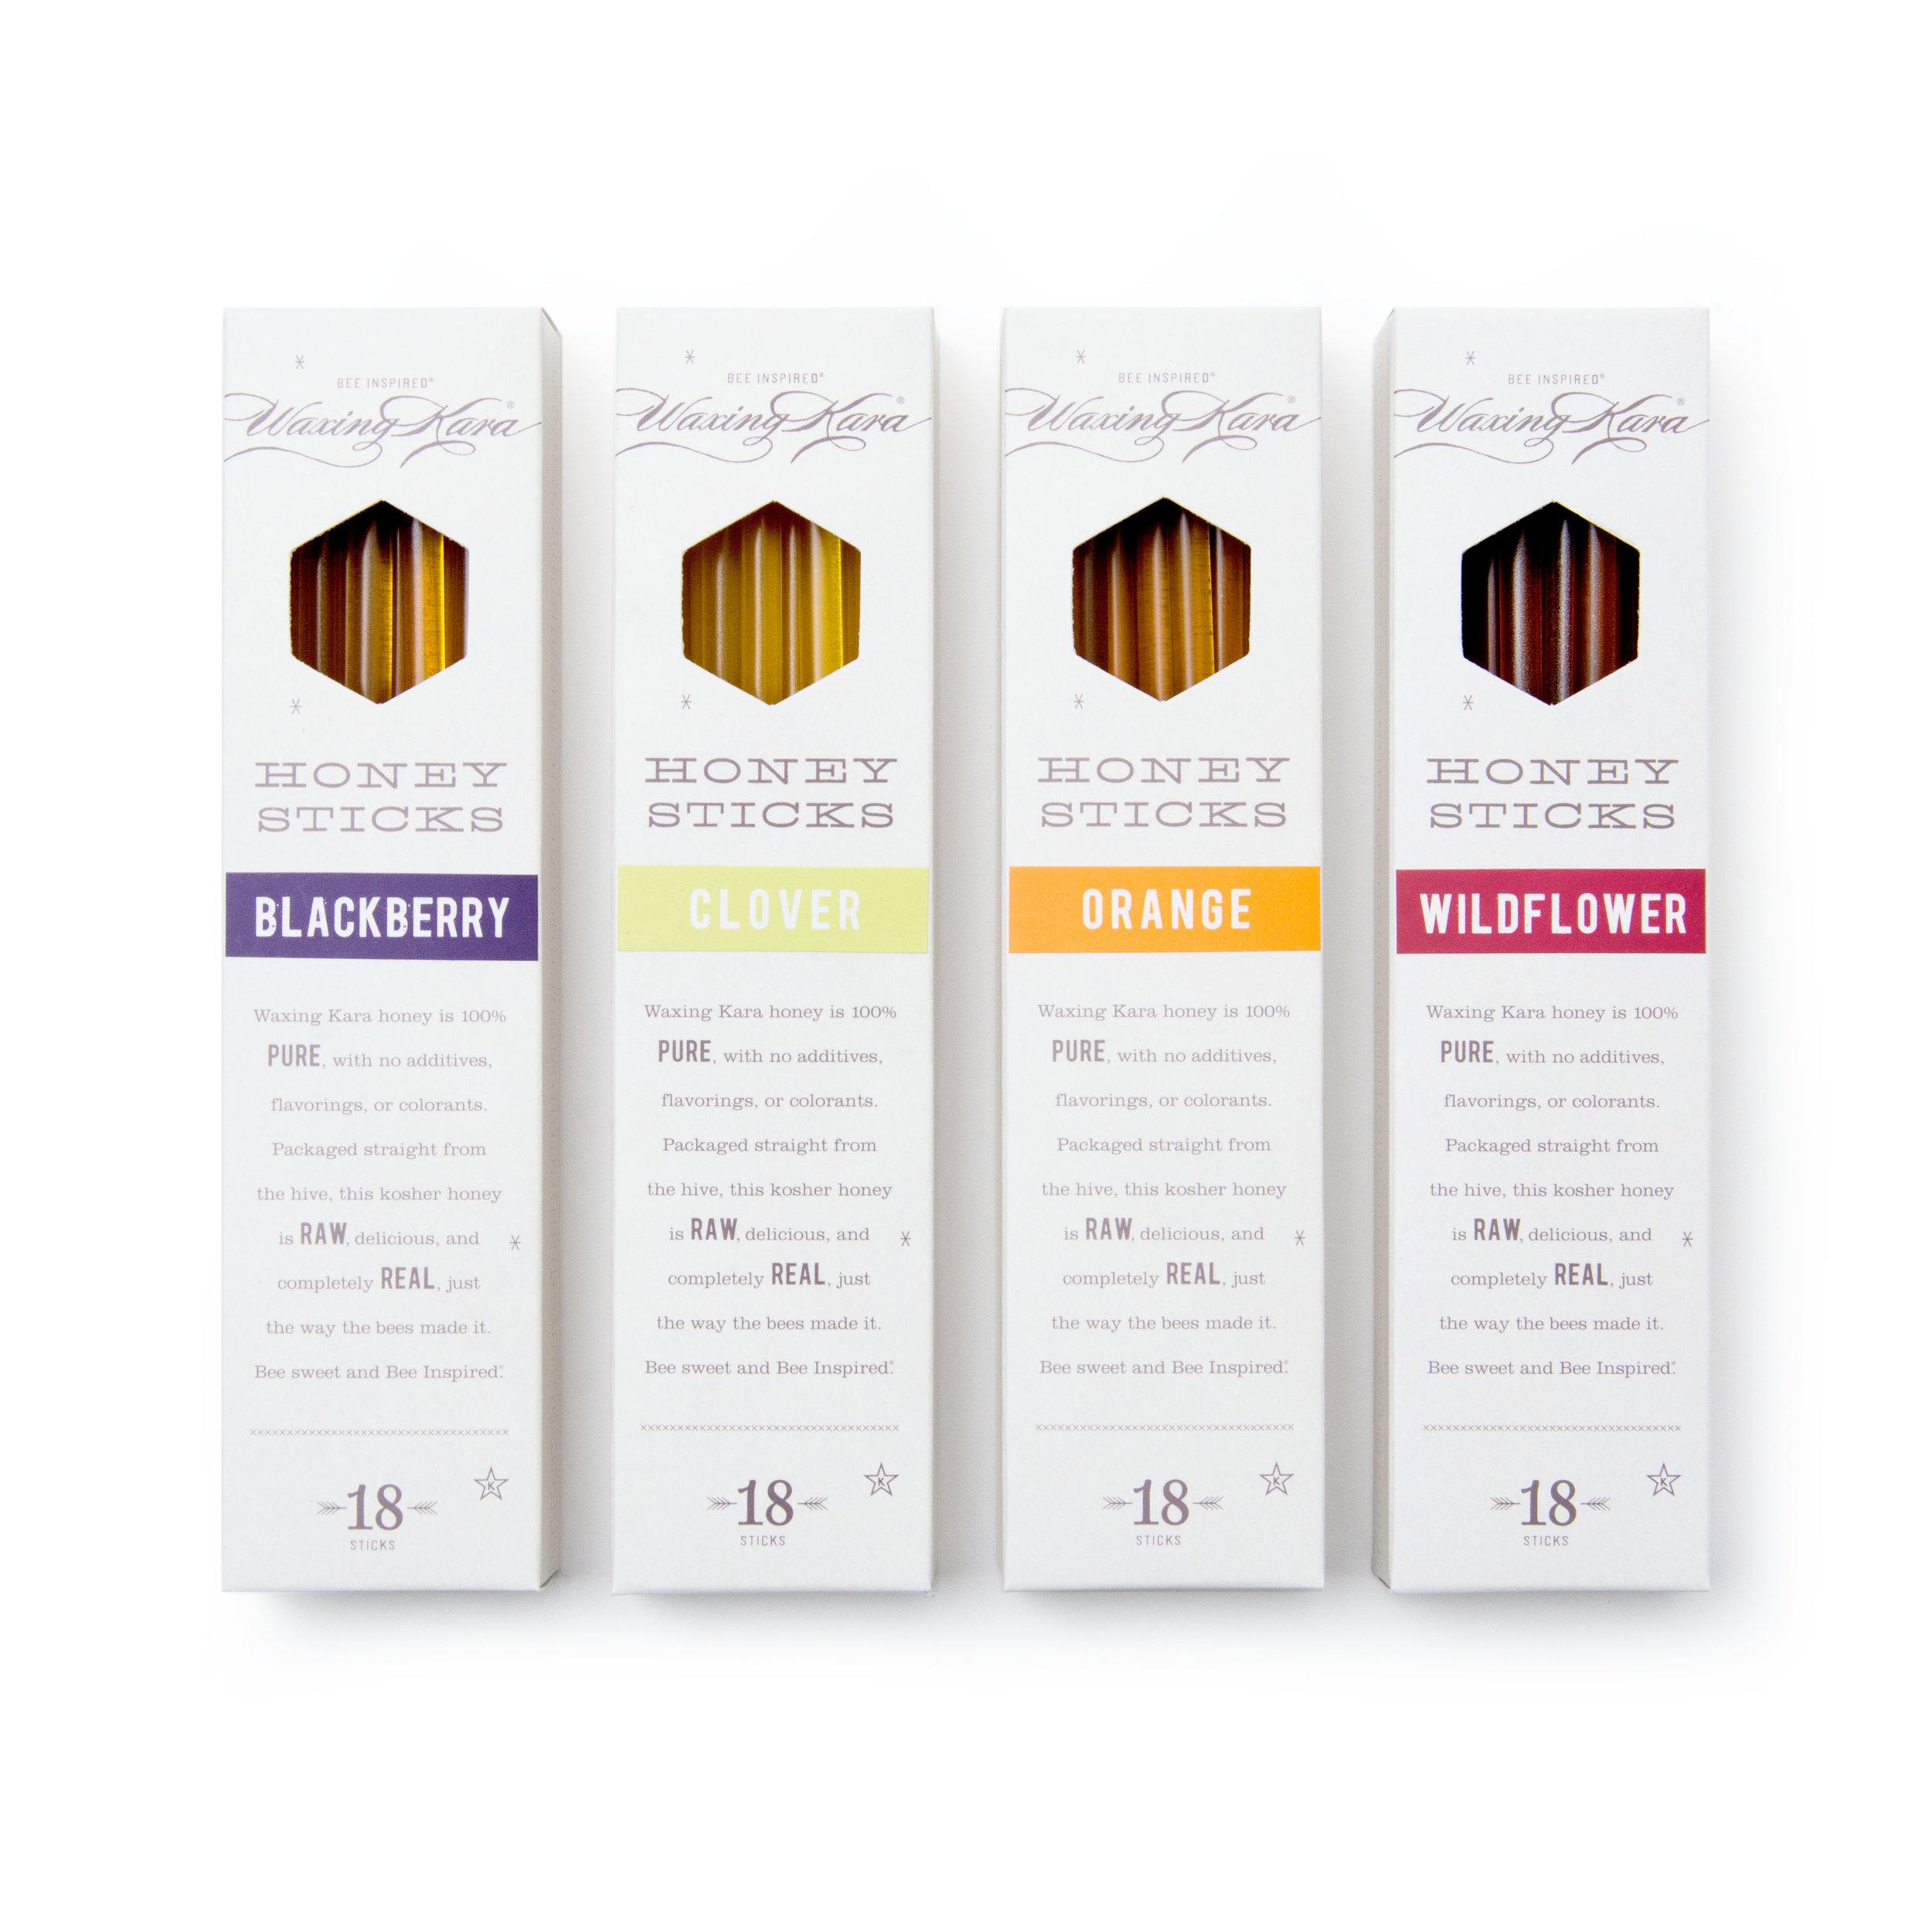 Raw Honey Sticks from Waxing Kara